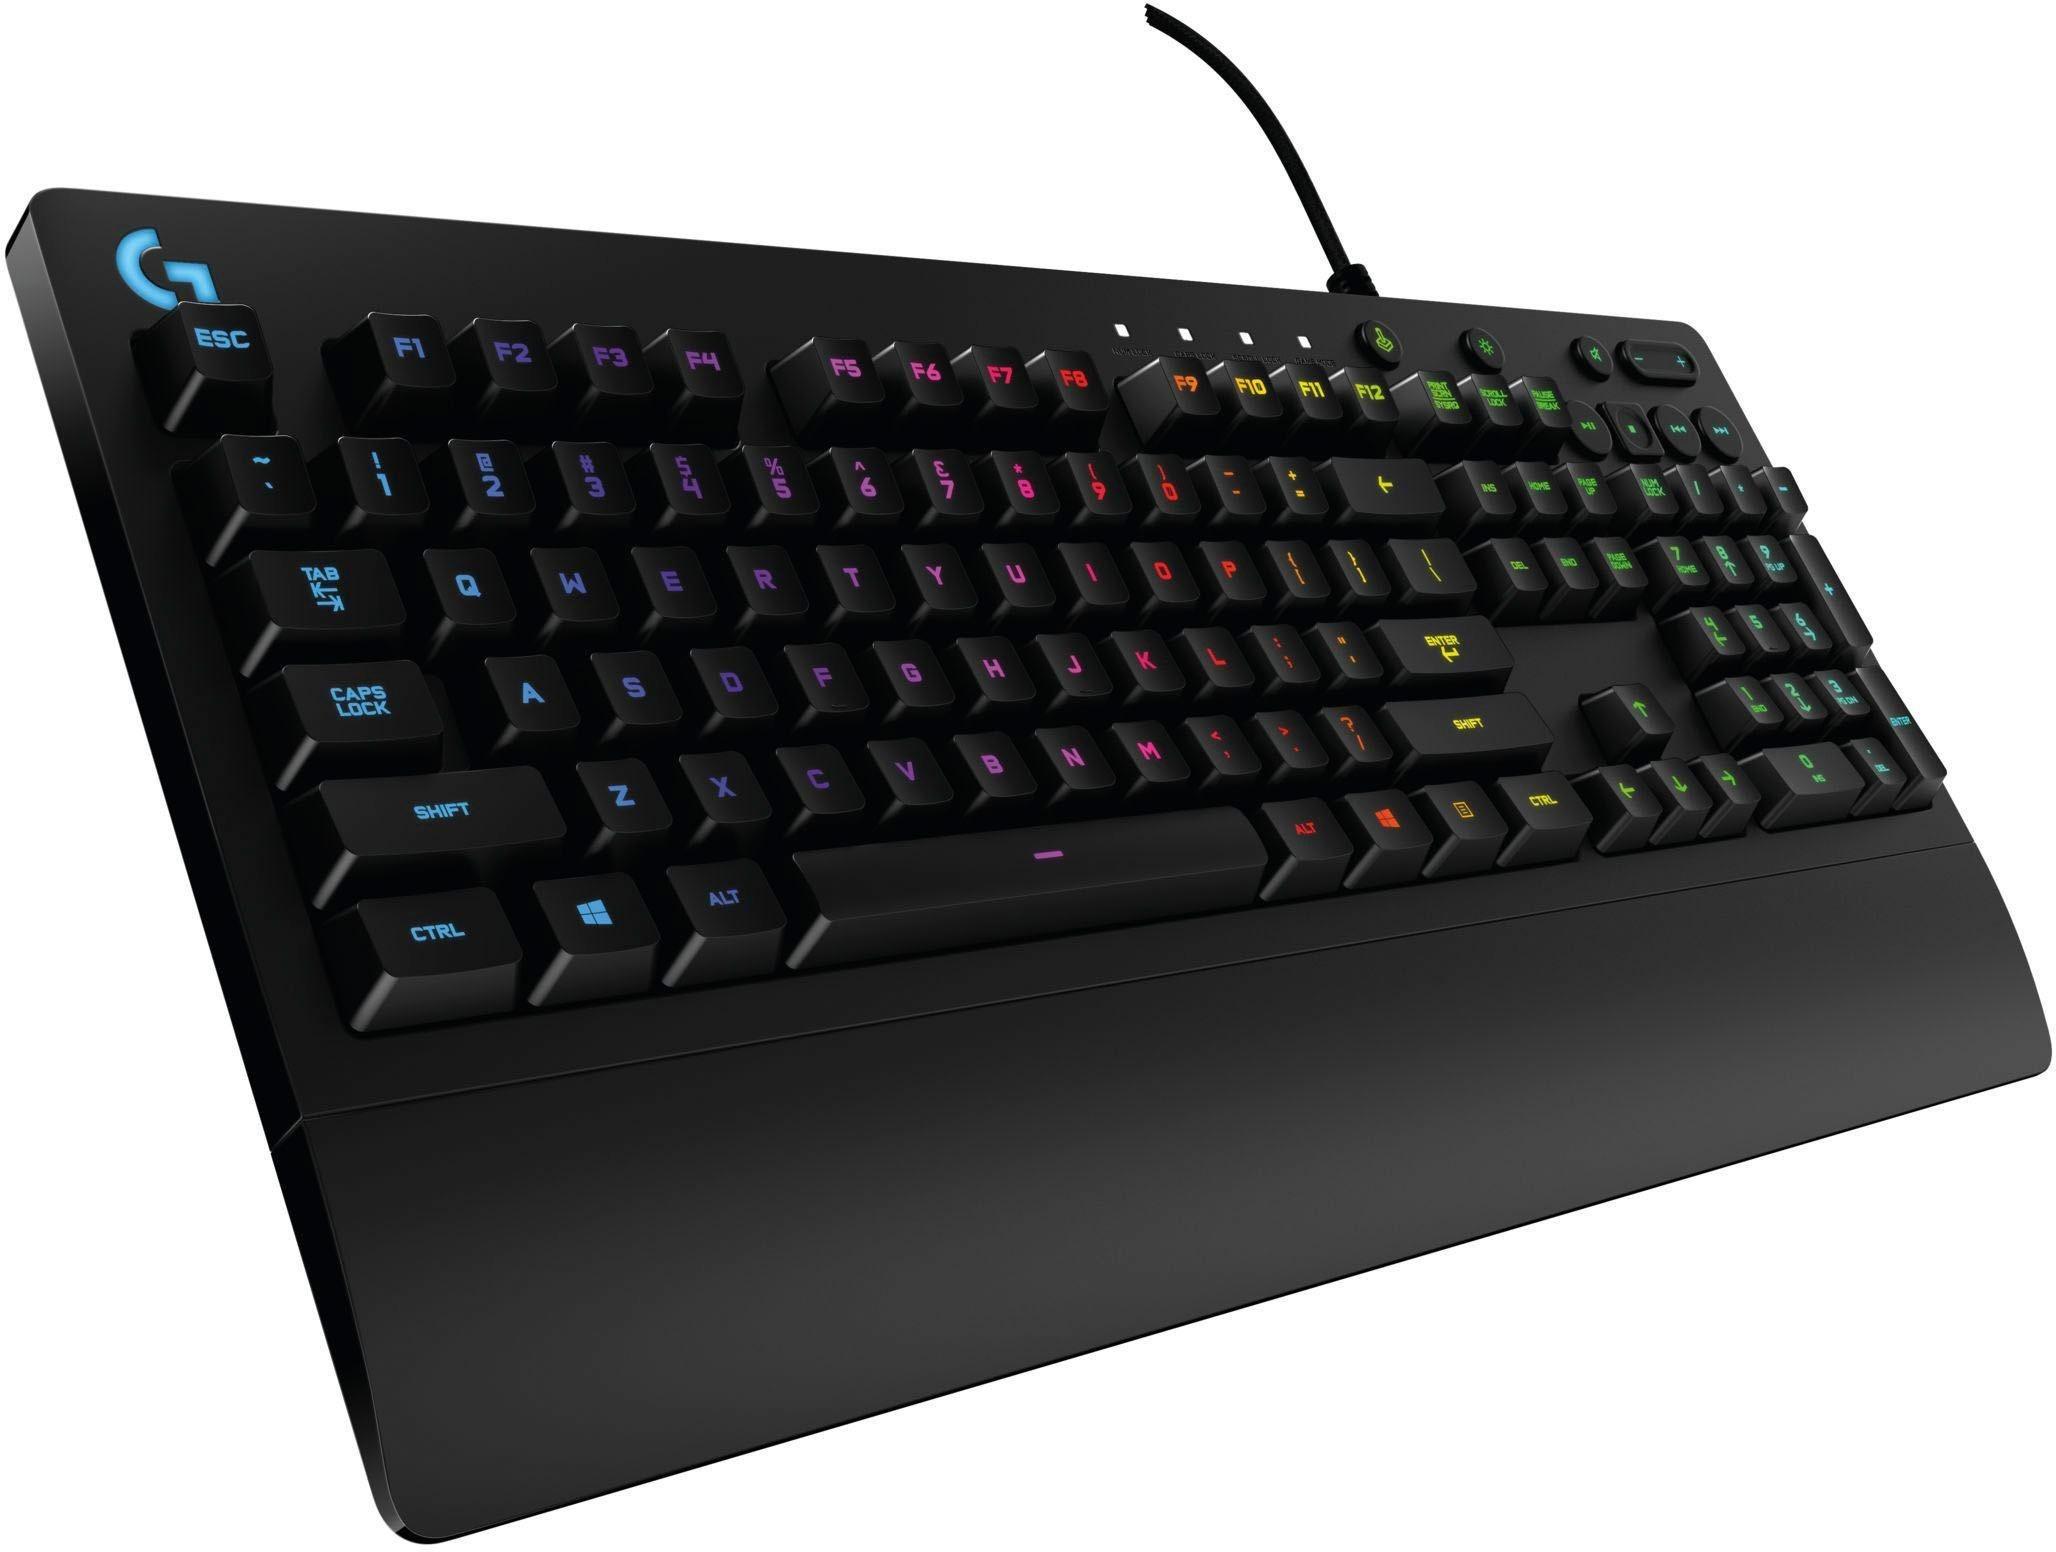 »G213 Prodigy« Gaming-Tastatur (USB-Anschluss, Multimedia-Tasten)